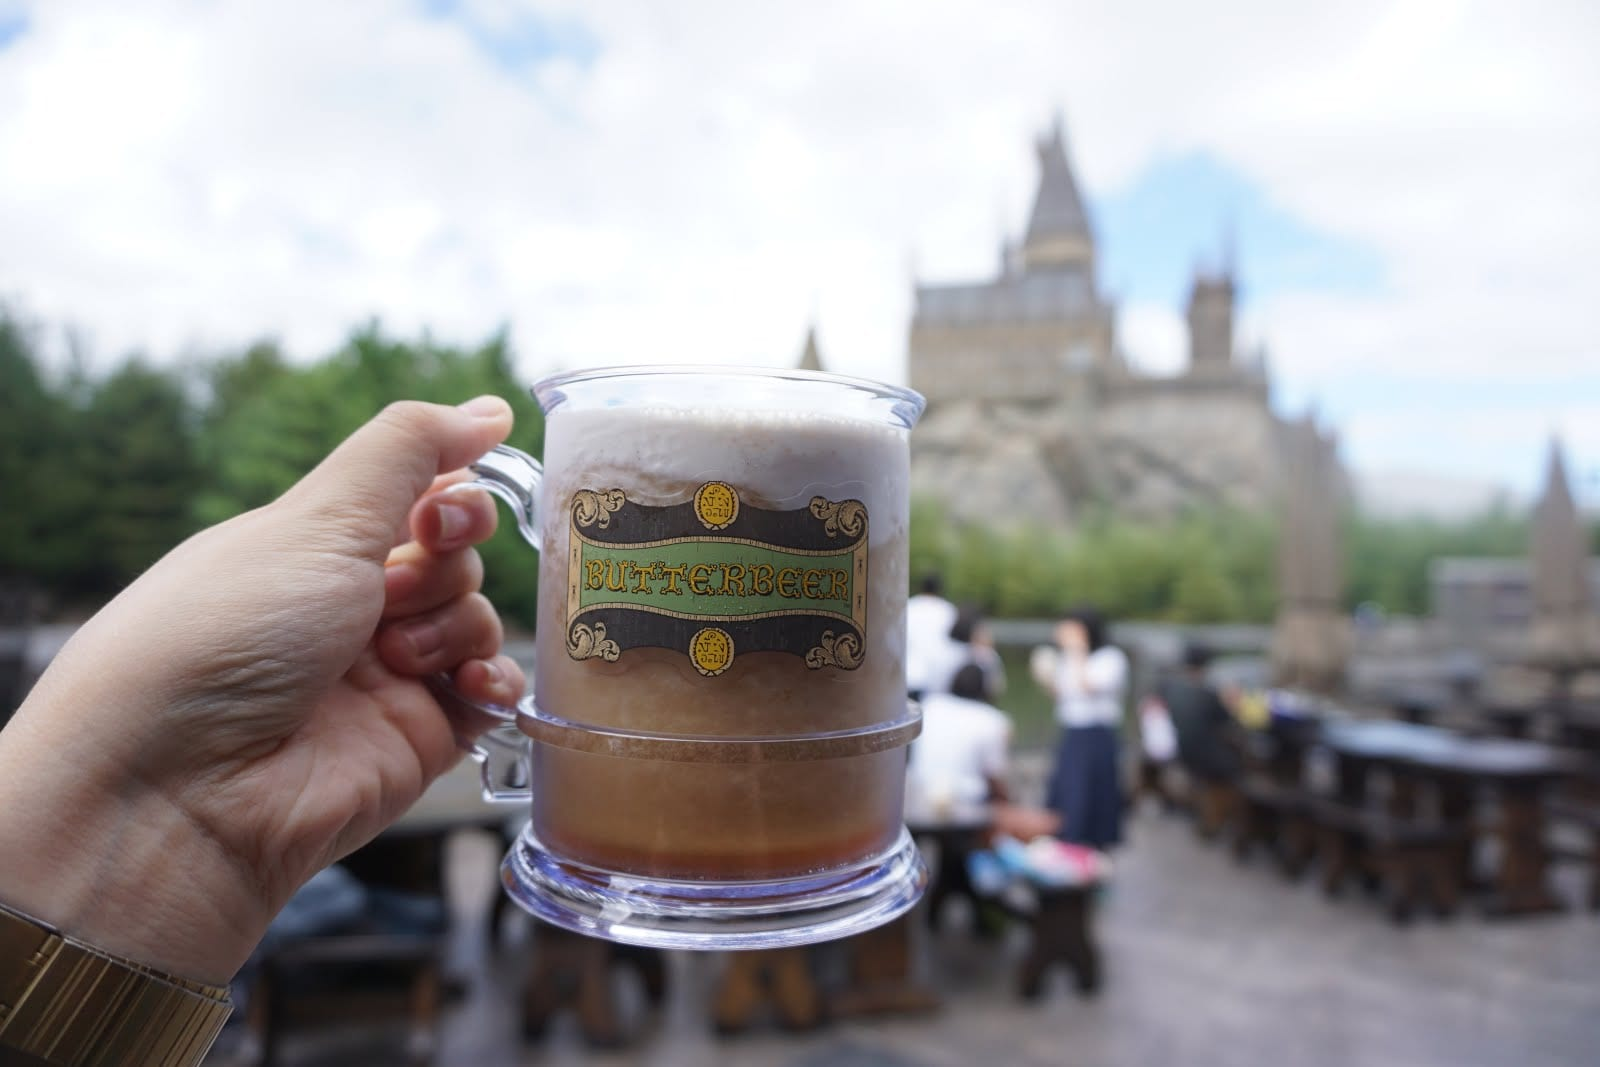 Wizarding World of Harry Potter - Butterbeer